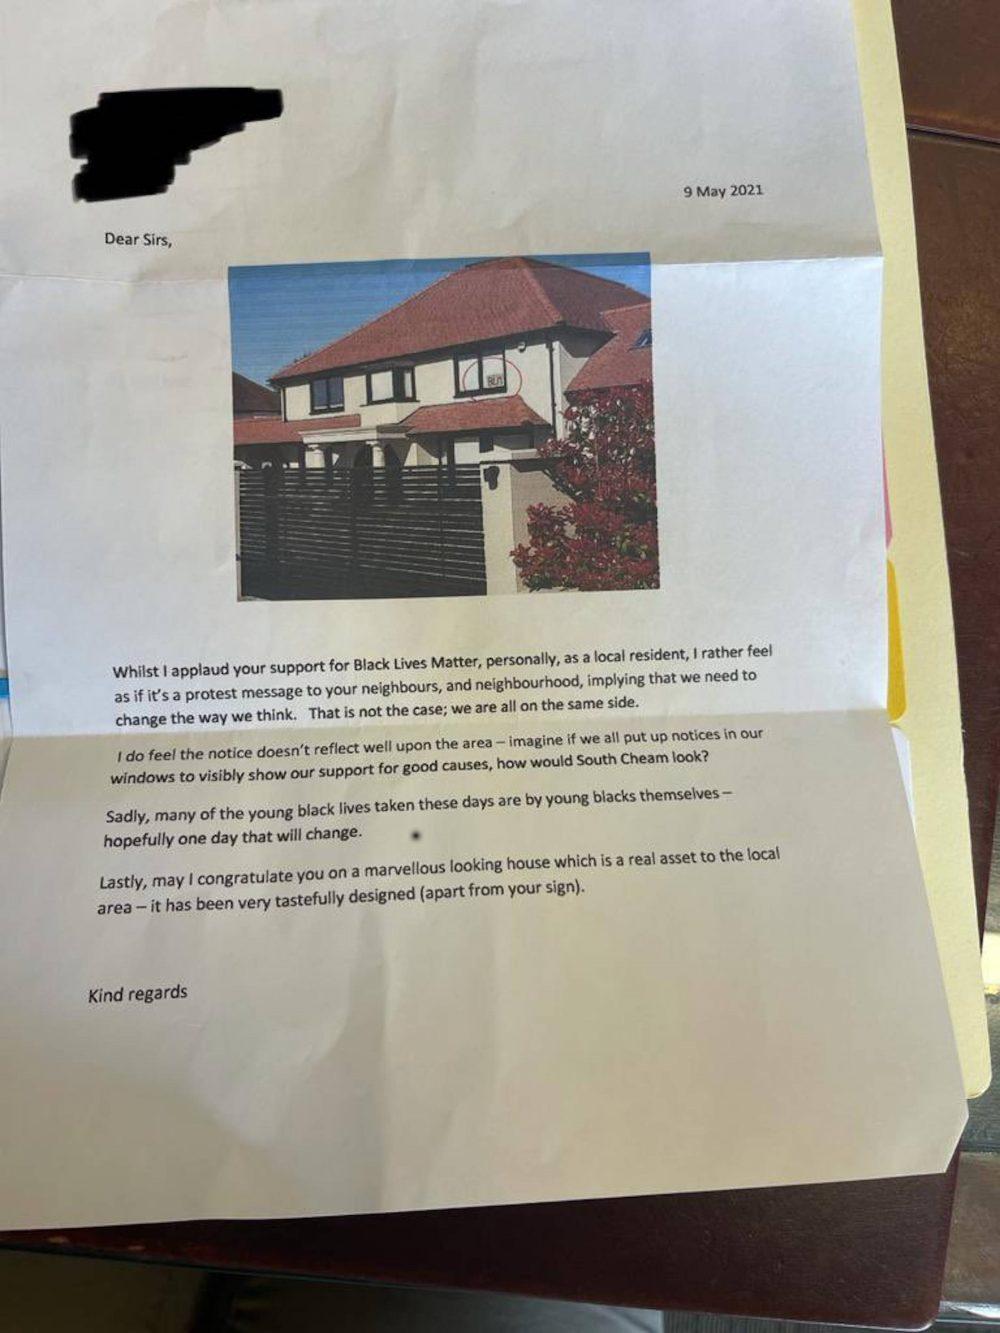 Letter objecting to Black Lives Matter poster | Community News UK